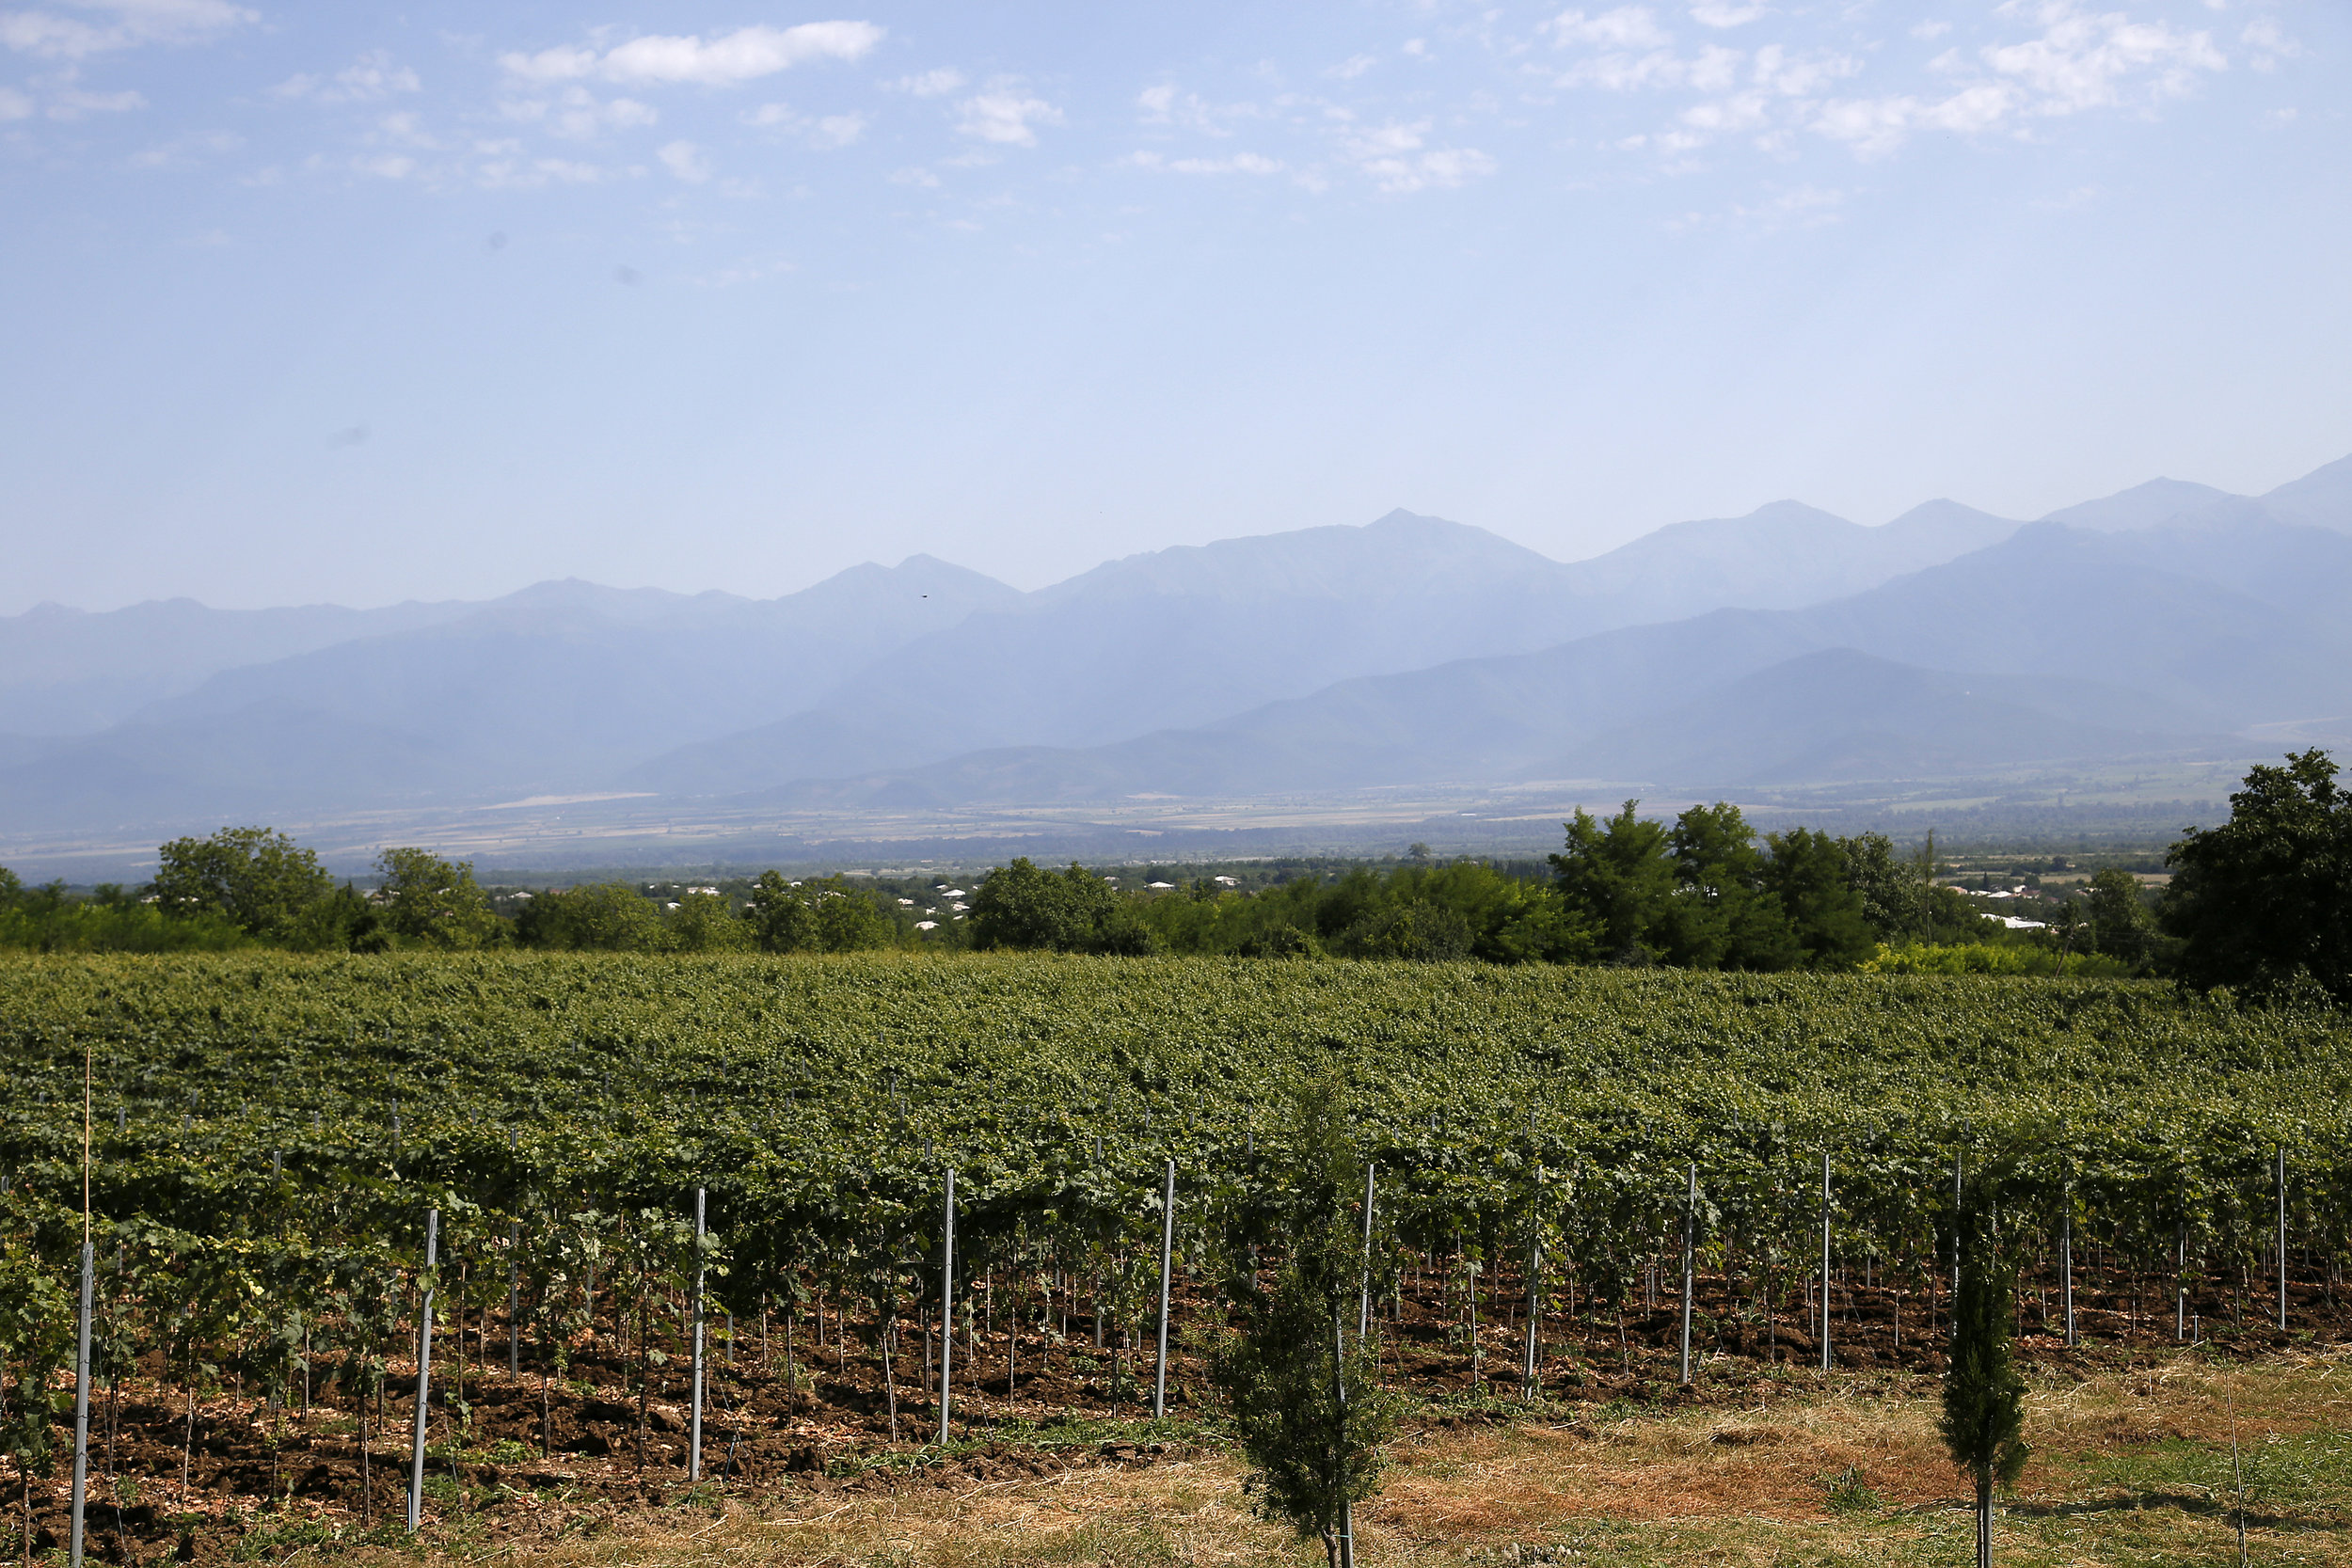 Overlooking the vineyard where organic grapes are grown for premium Georgian wine